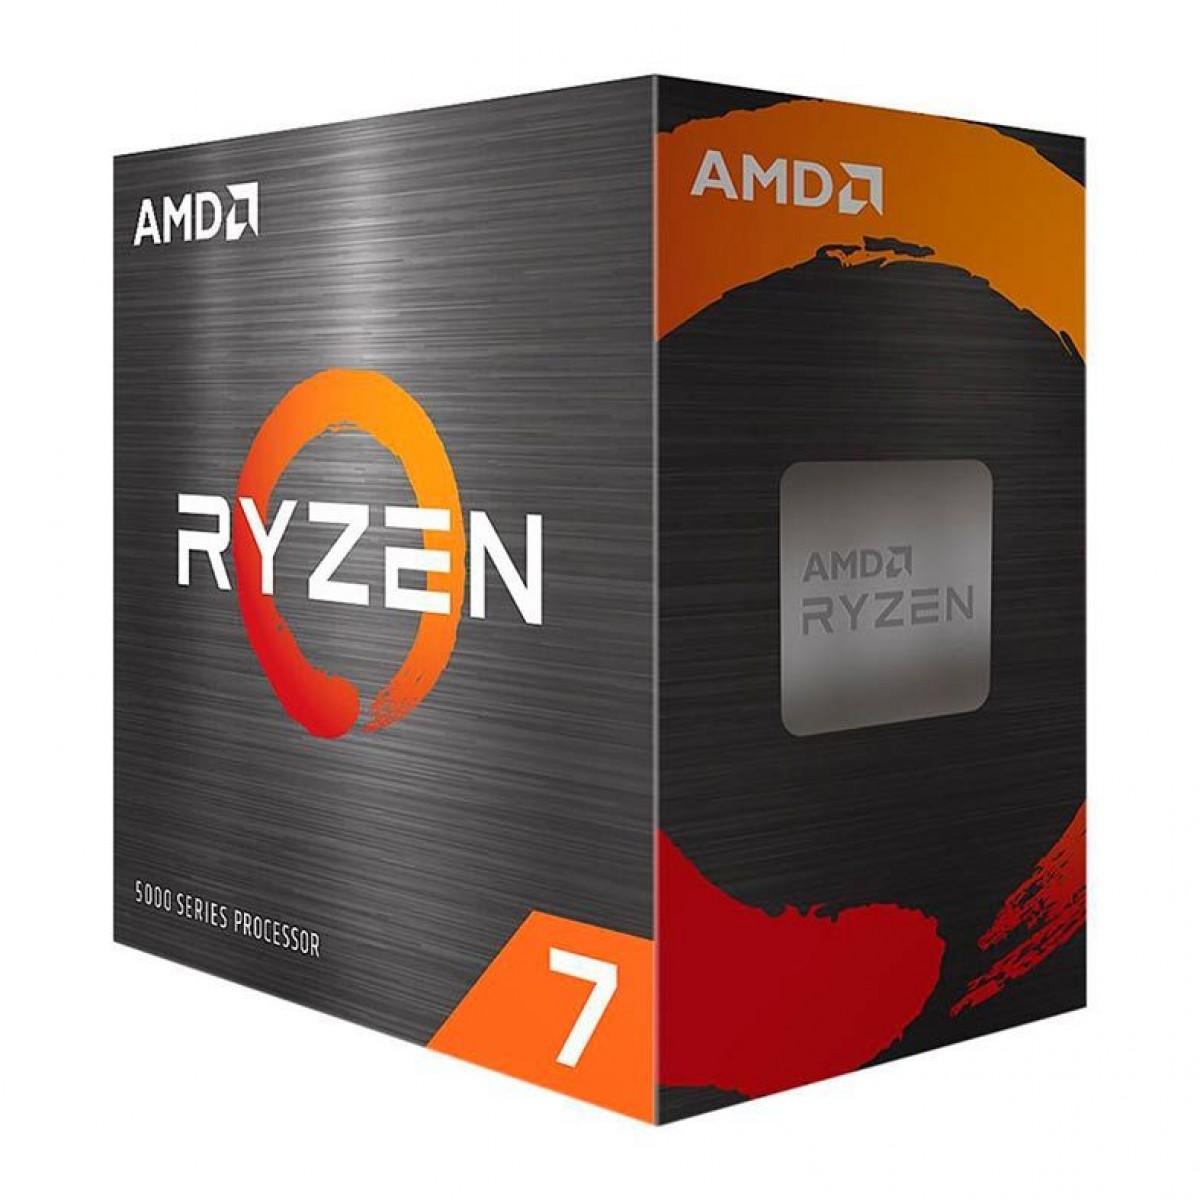 Kit Upgrade, Asus Prime B450M Gaming/BR + AMD Ryzen 7 5700G + Memória DDR4, 16GB/3000MHz